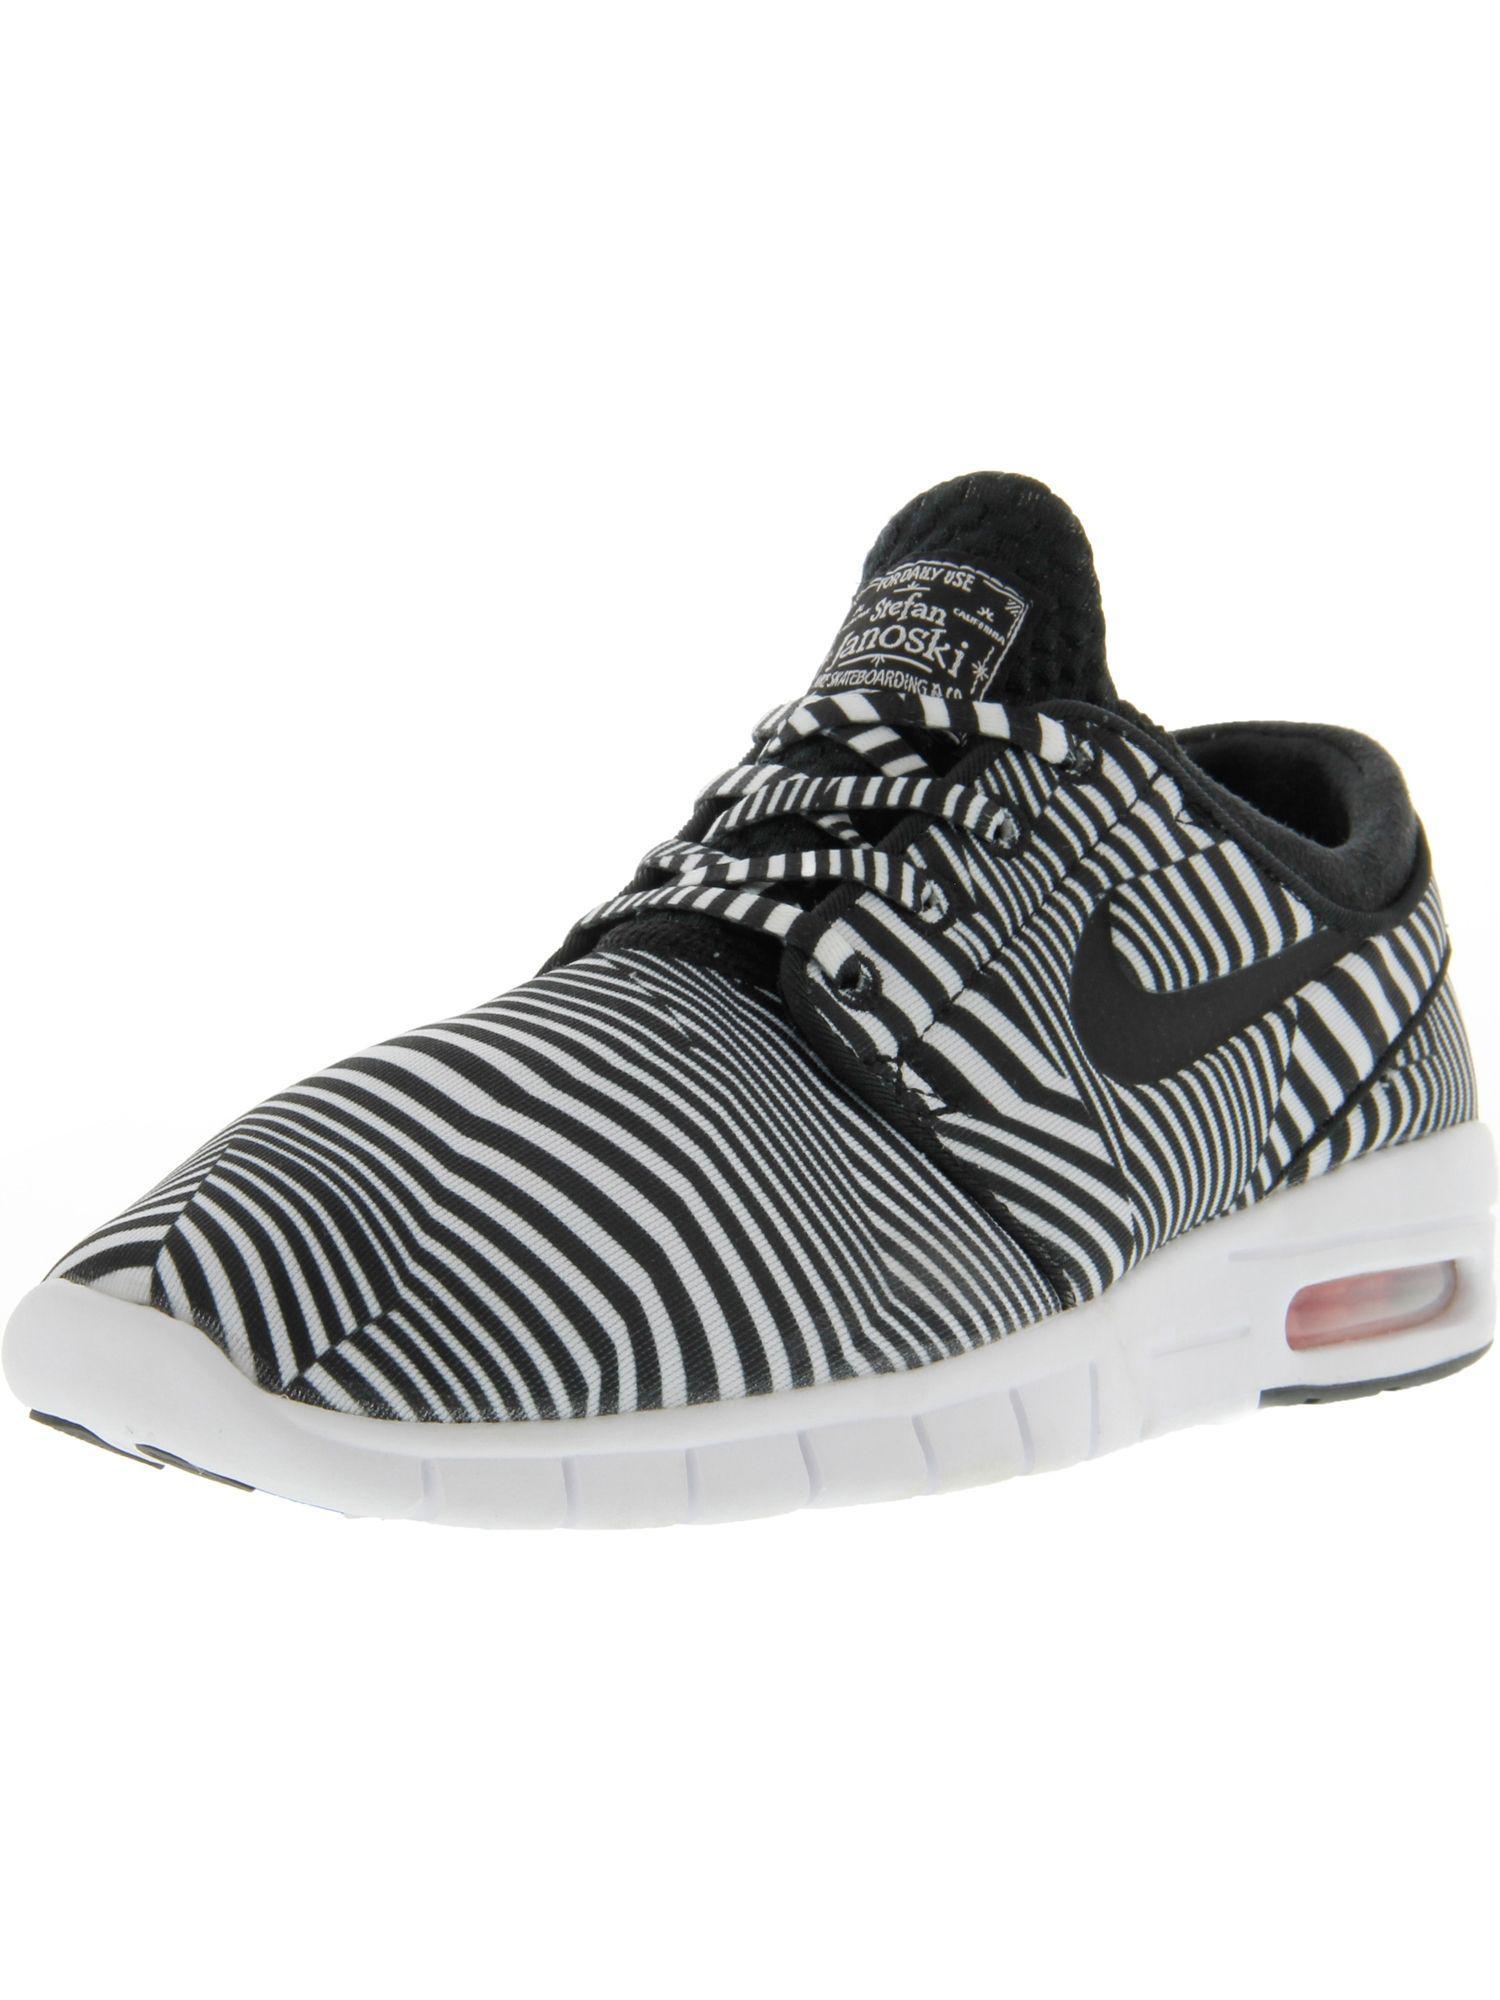 de77847d90 Lyst - Nike Men's Stefan Janoski Max Qs Ankle-high Fashion Sneaker ...